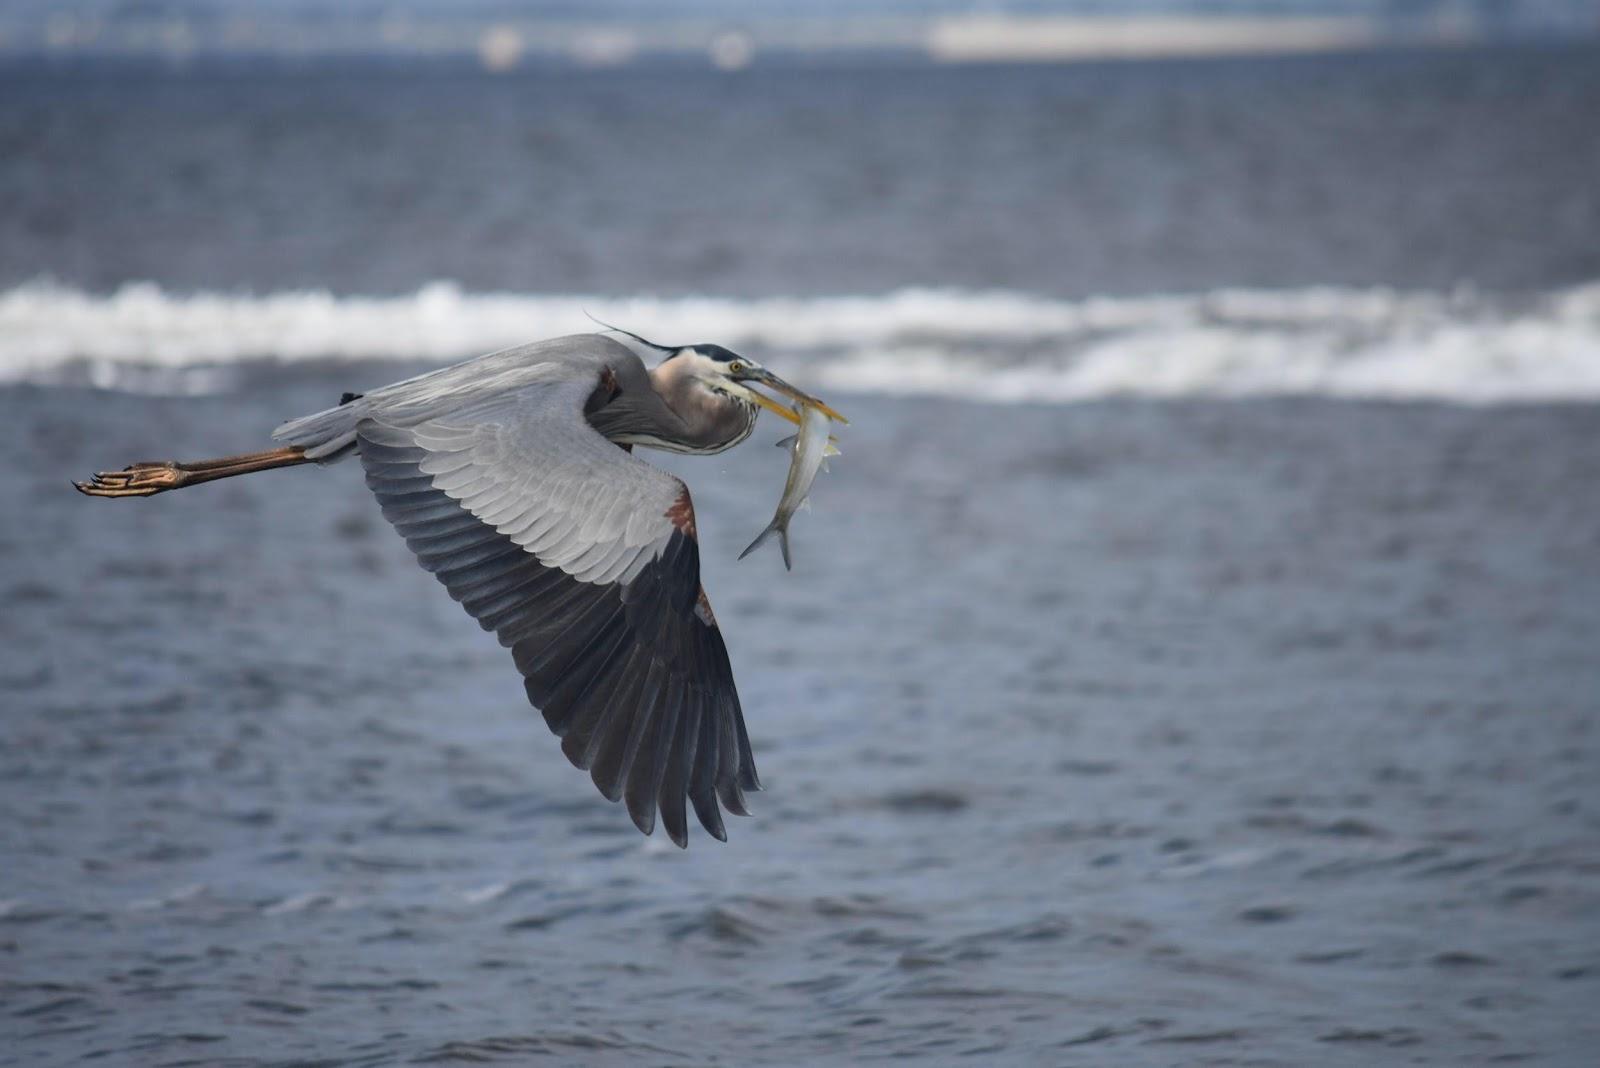 bird flying with fish